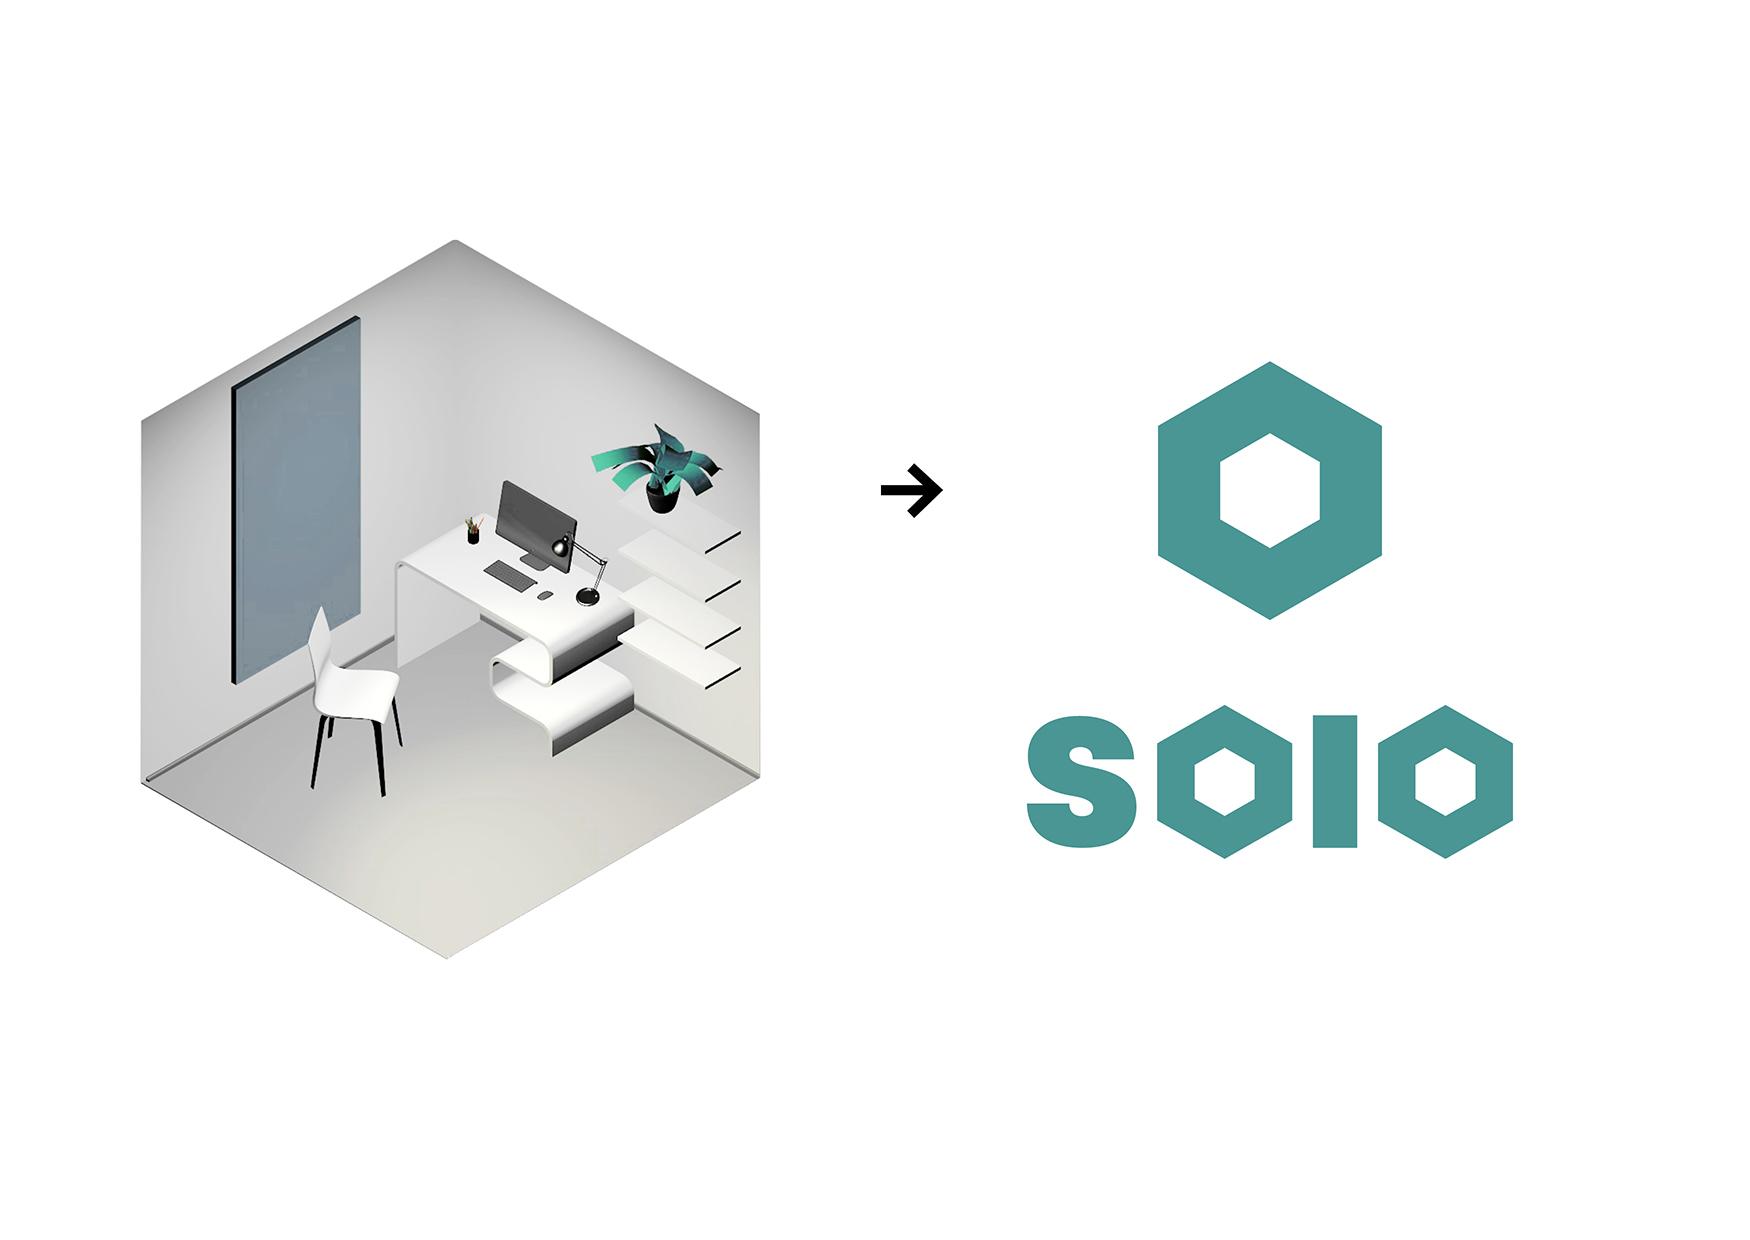 Anticoworking Solo Student Branding Concept by Polin Chestnova